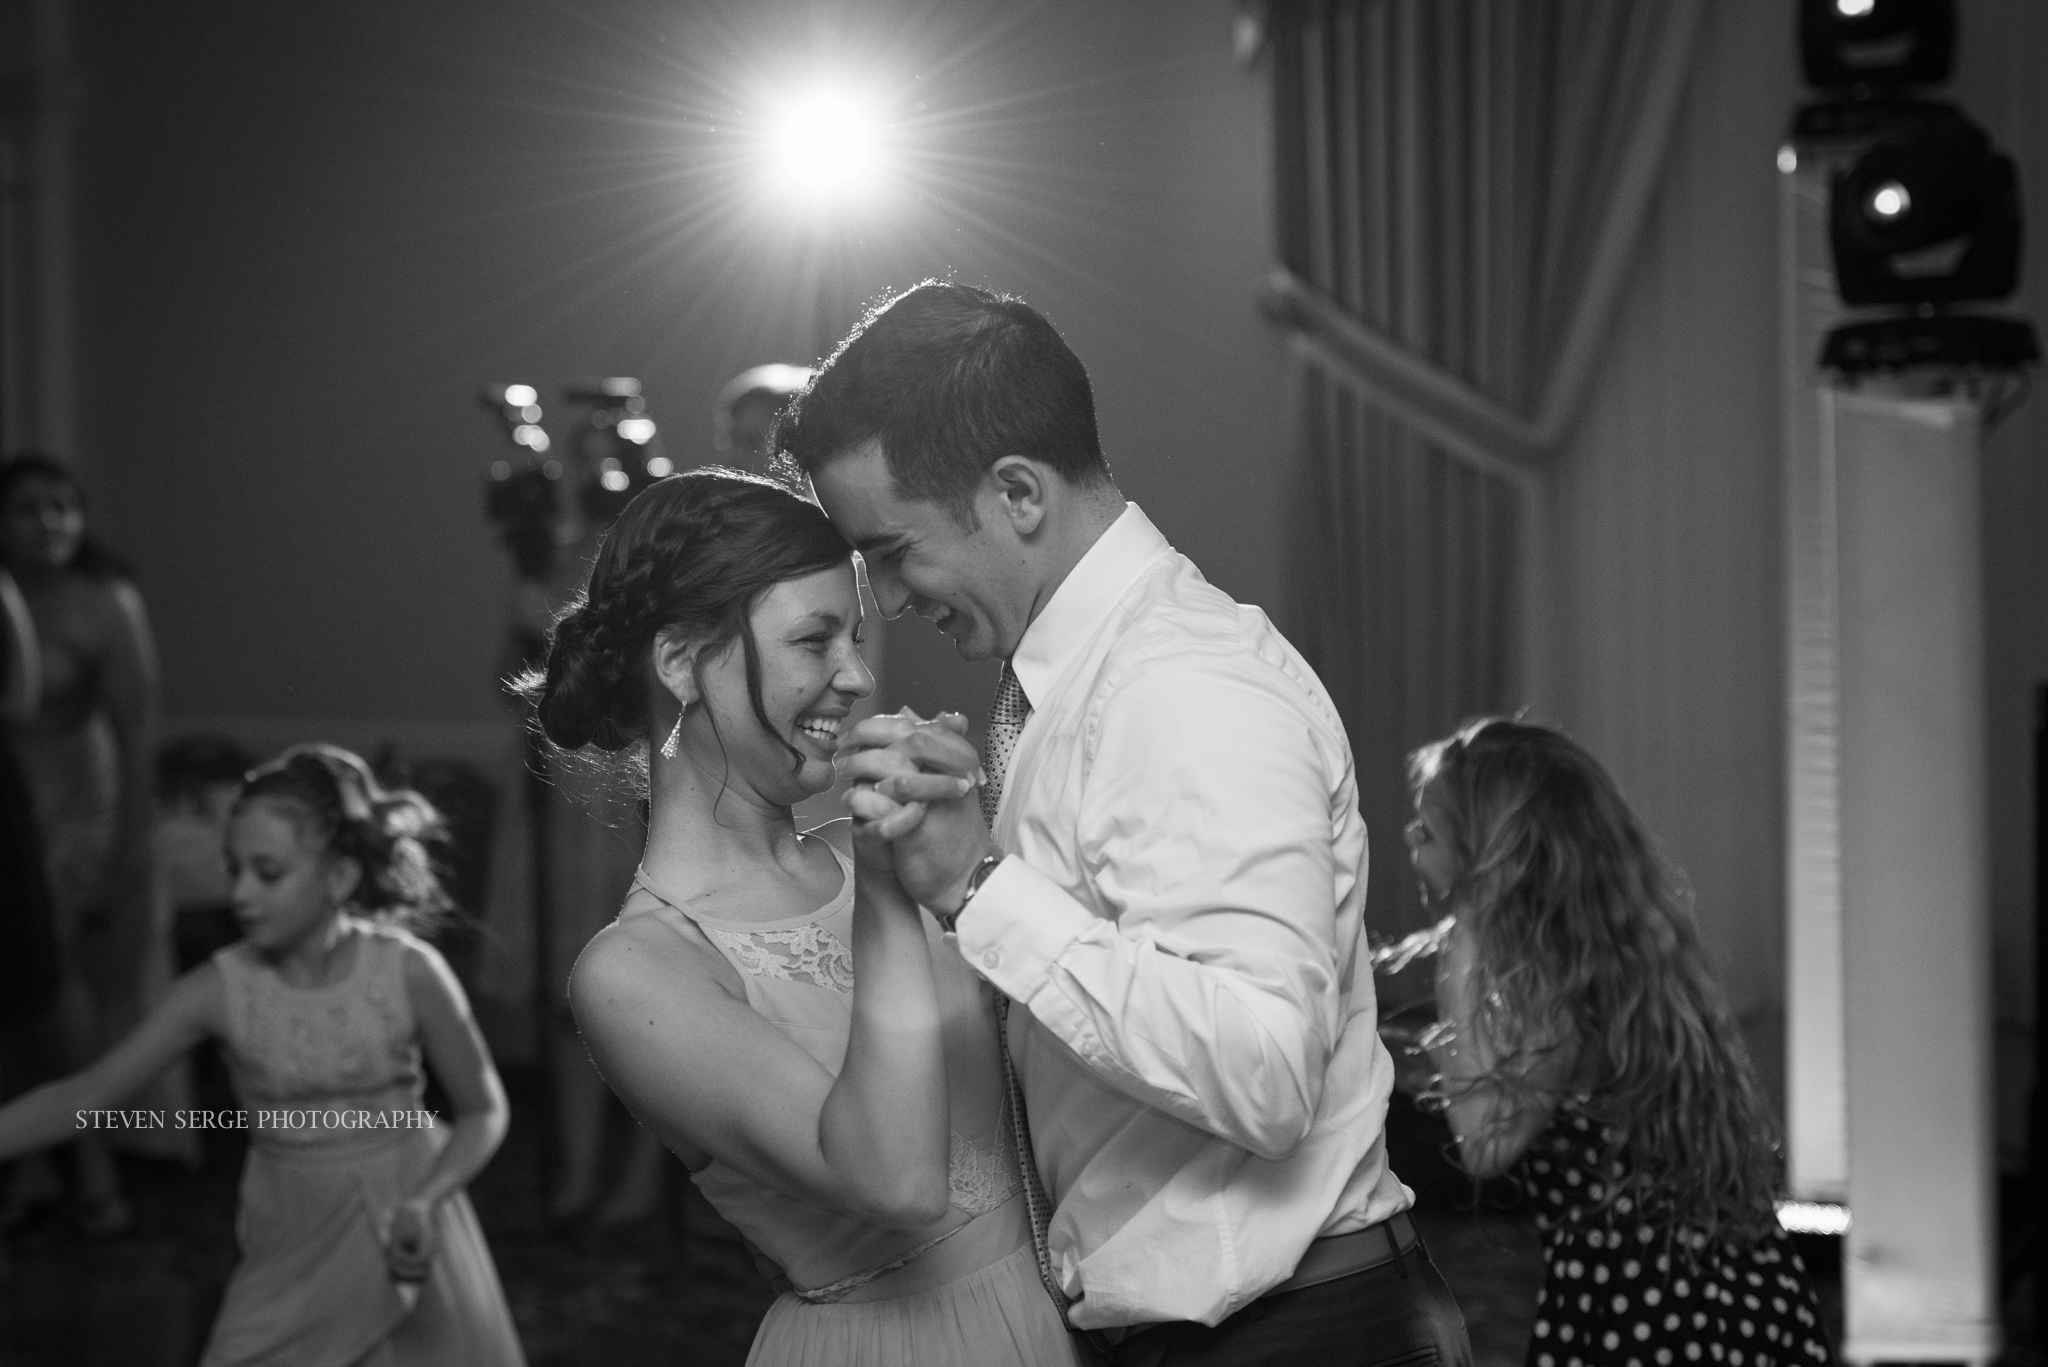 Scranton-wedding-photographer-fiorellis-steven-serge-60.jpg